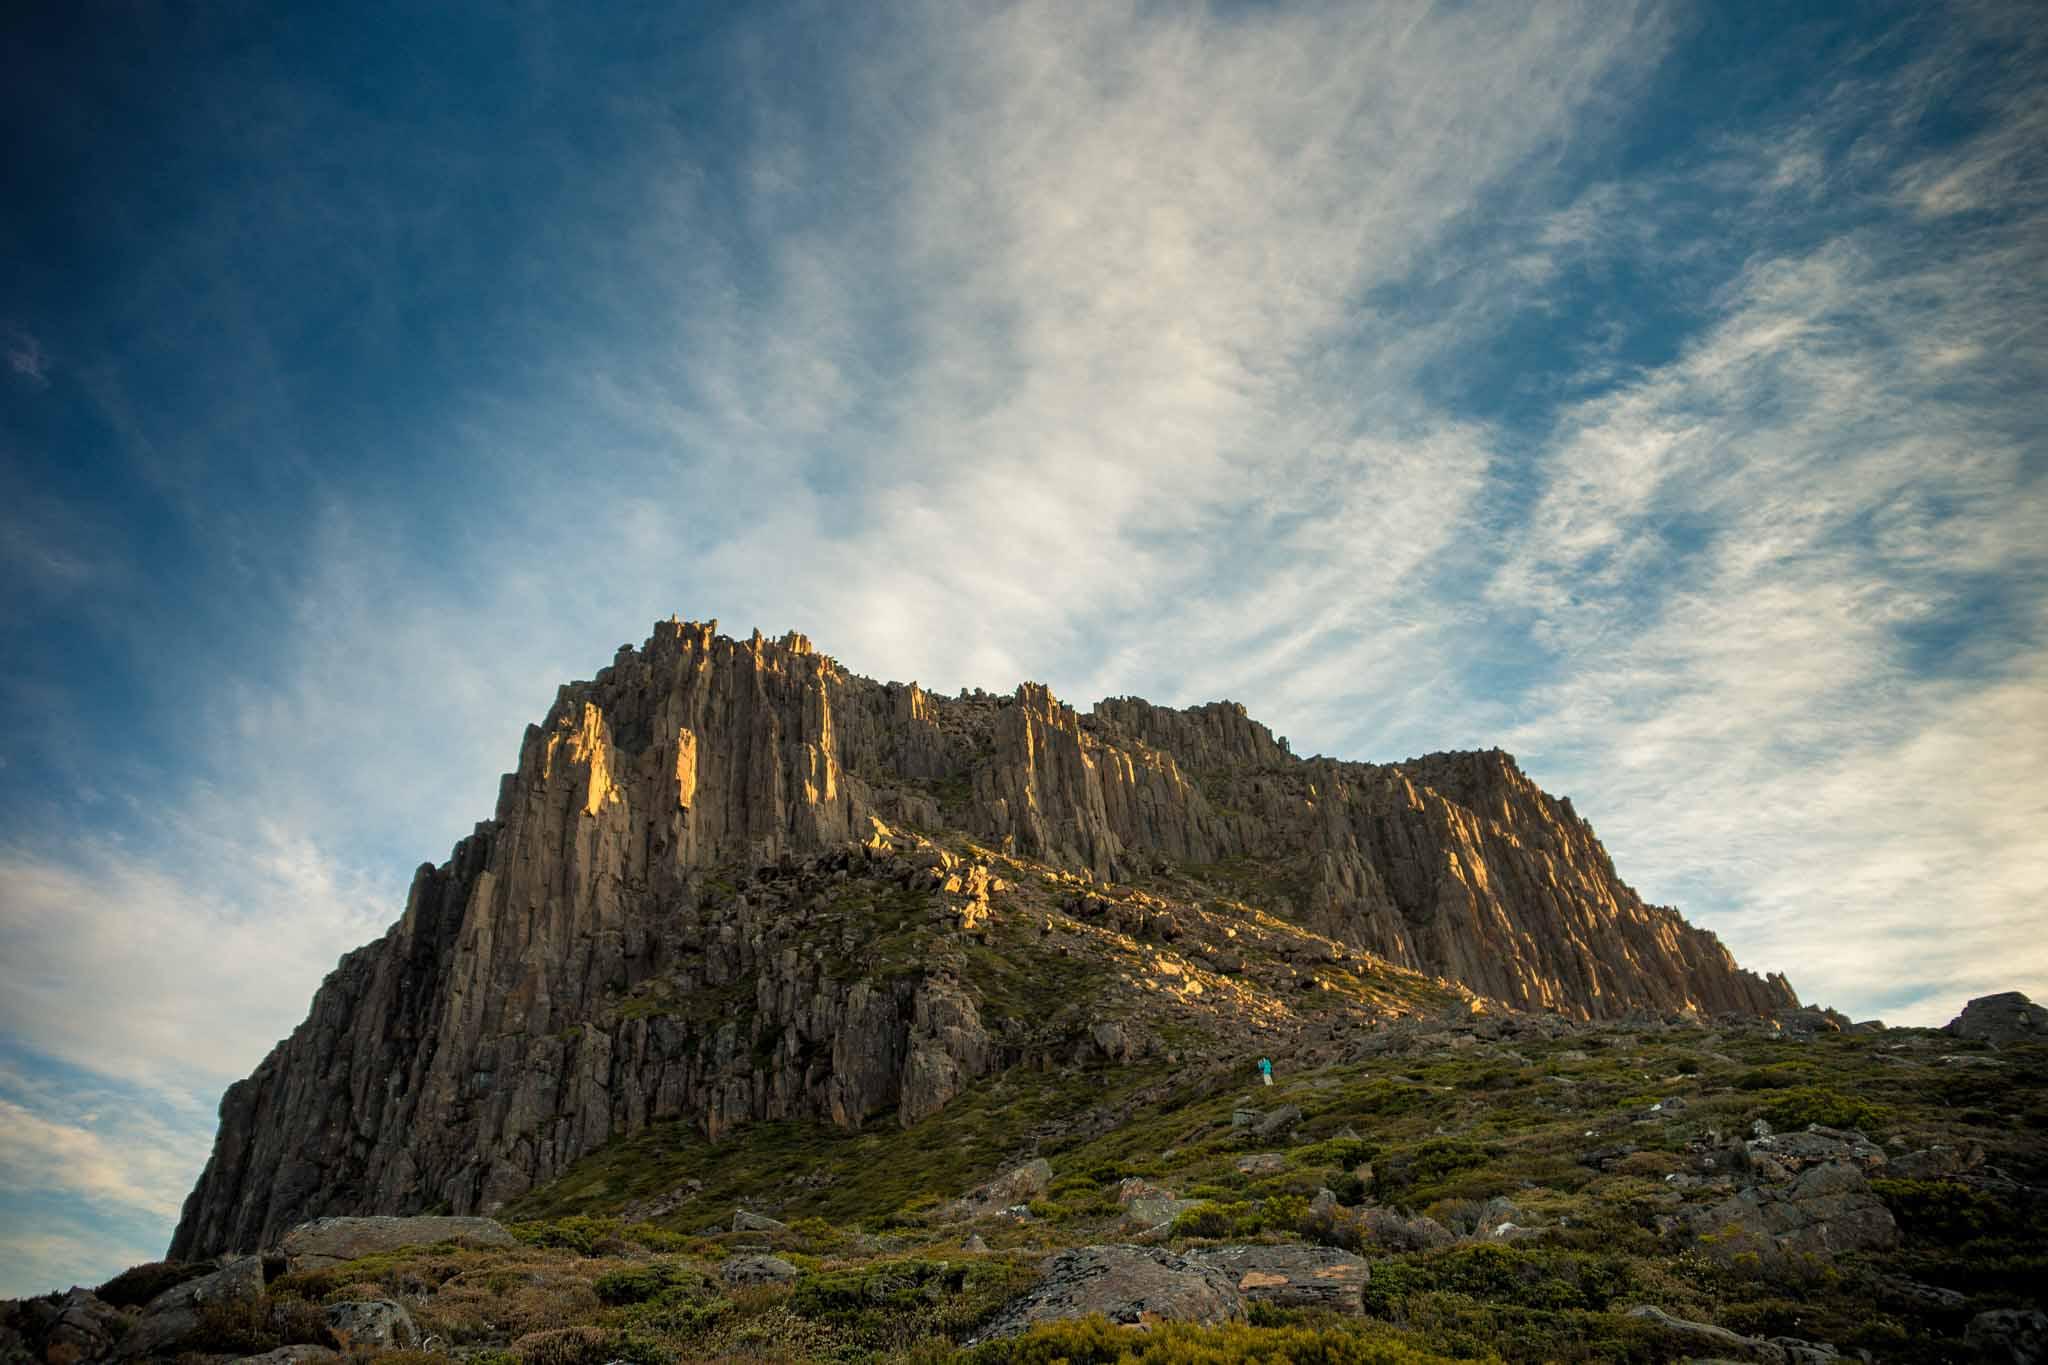 Barn-Bluff-Overland-Track-Tasmania